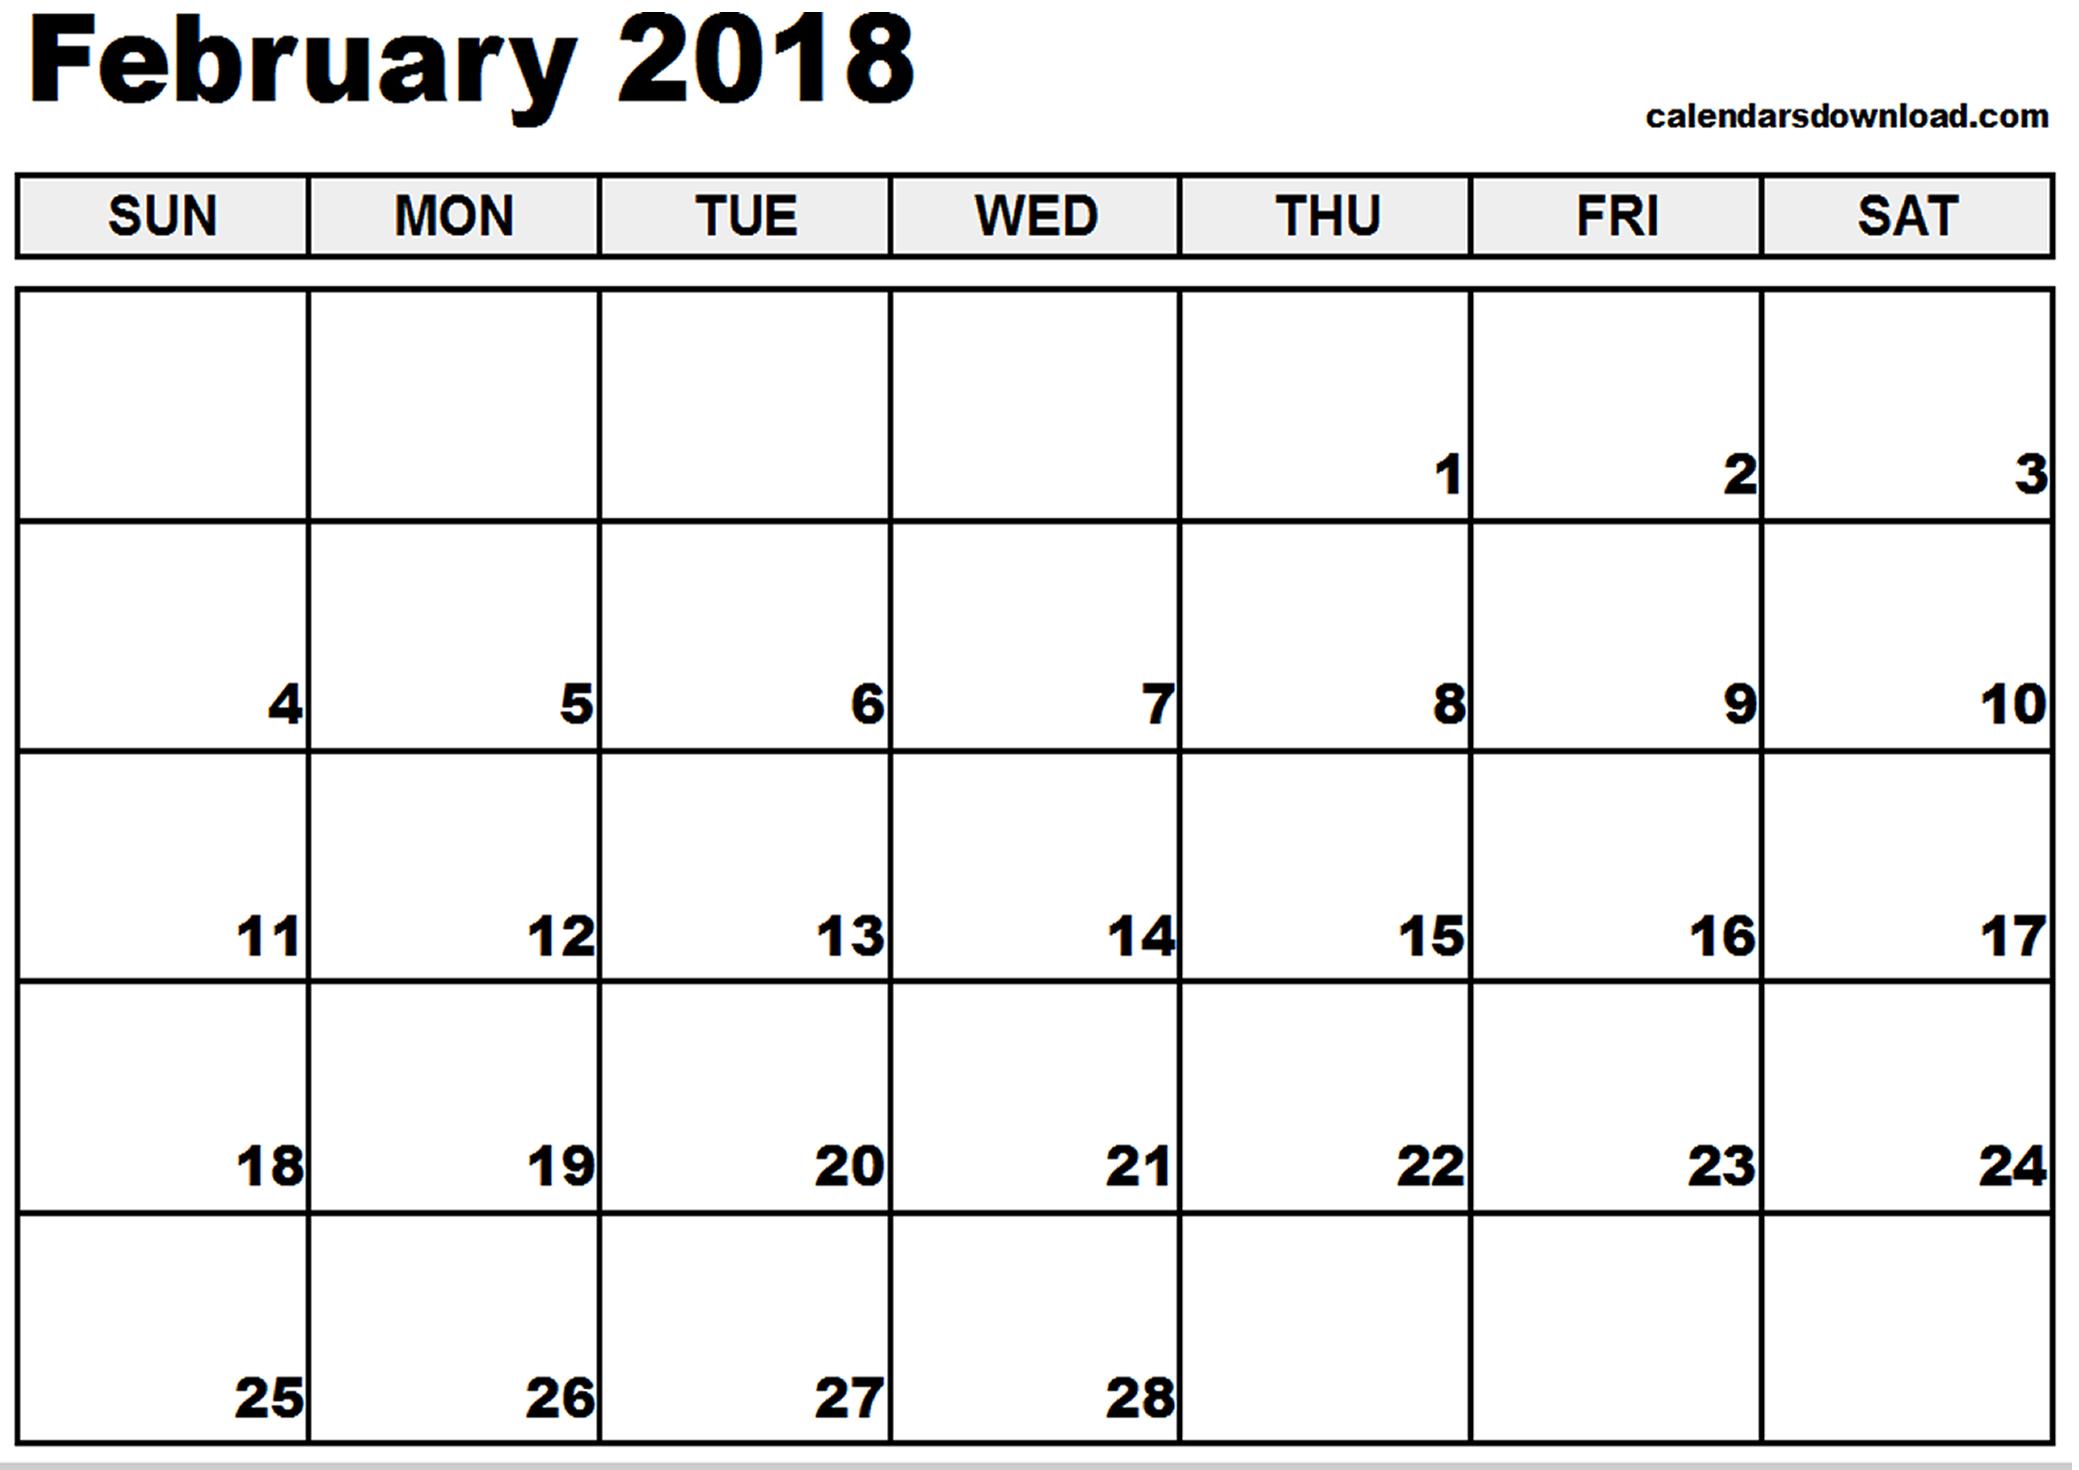 February 2018 Calendar | yearly calendar printable